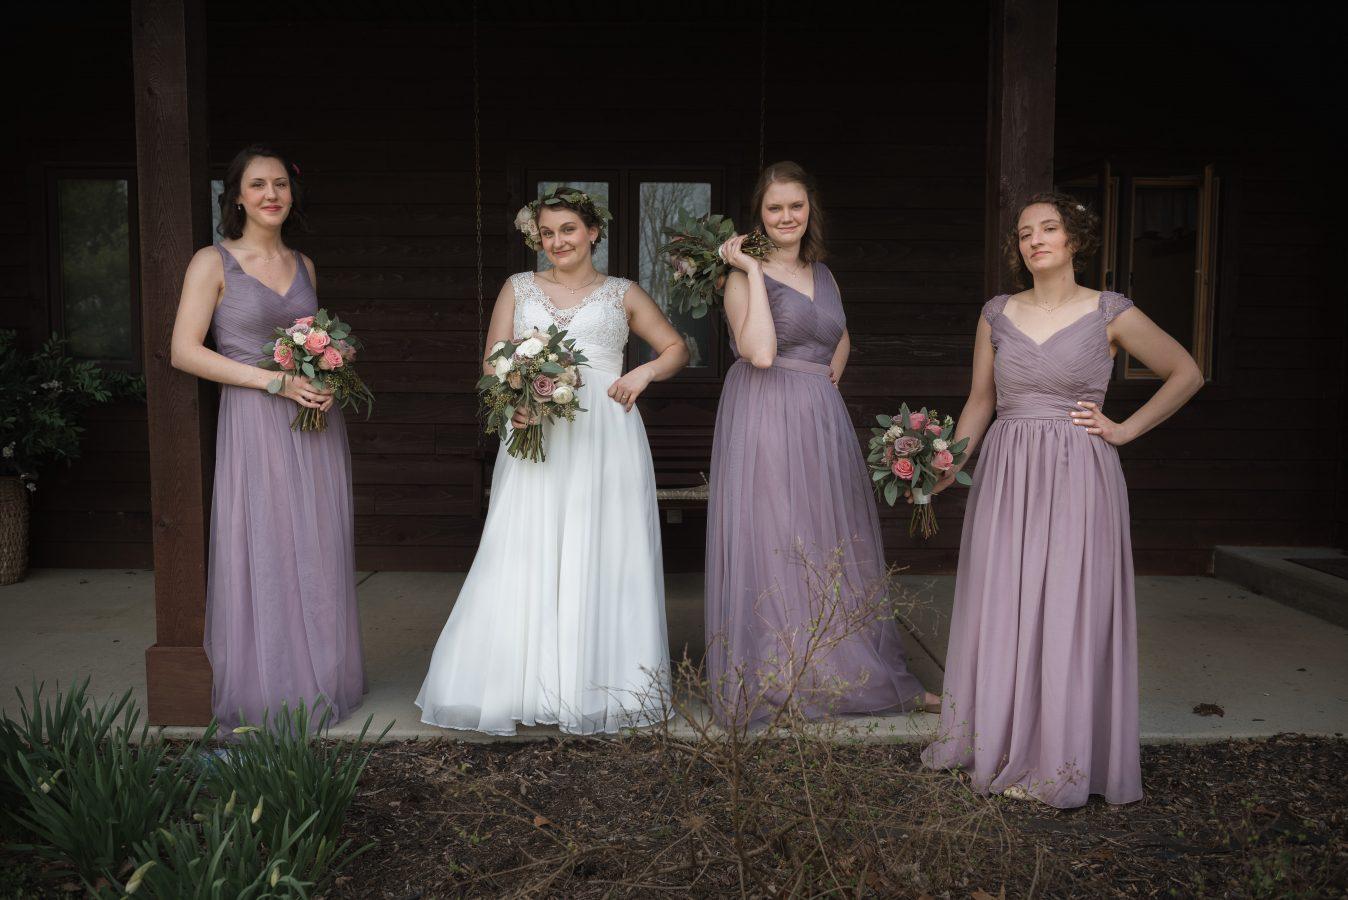 Marriage_Photography__Bride_Groom_wedding_Athens_Ohio_OH_lifestyle_documentary